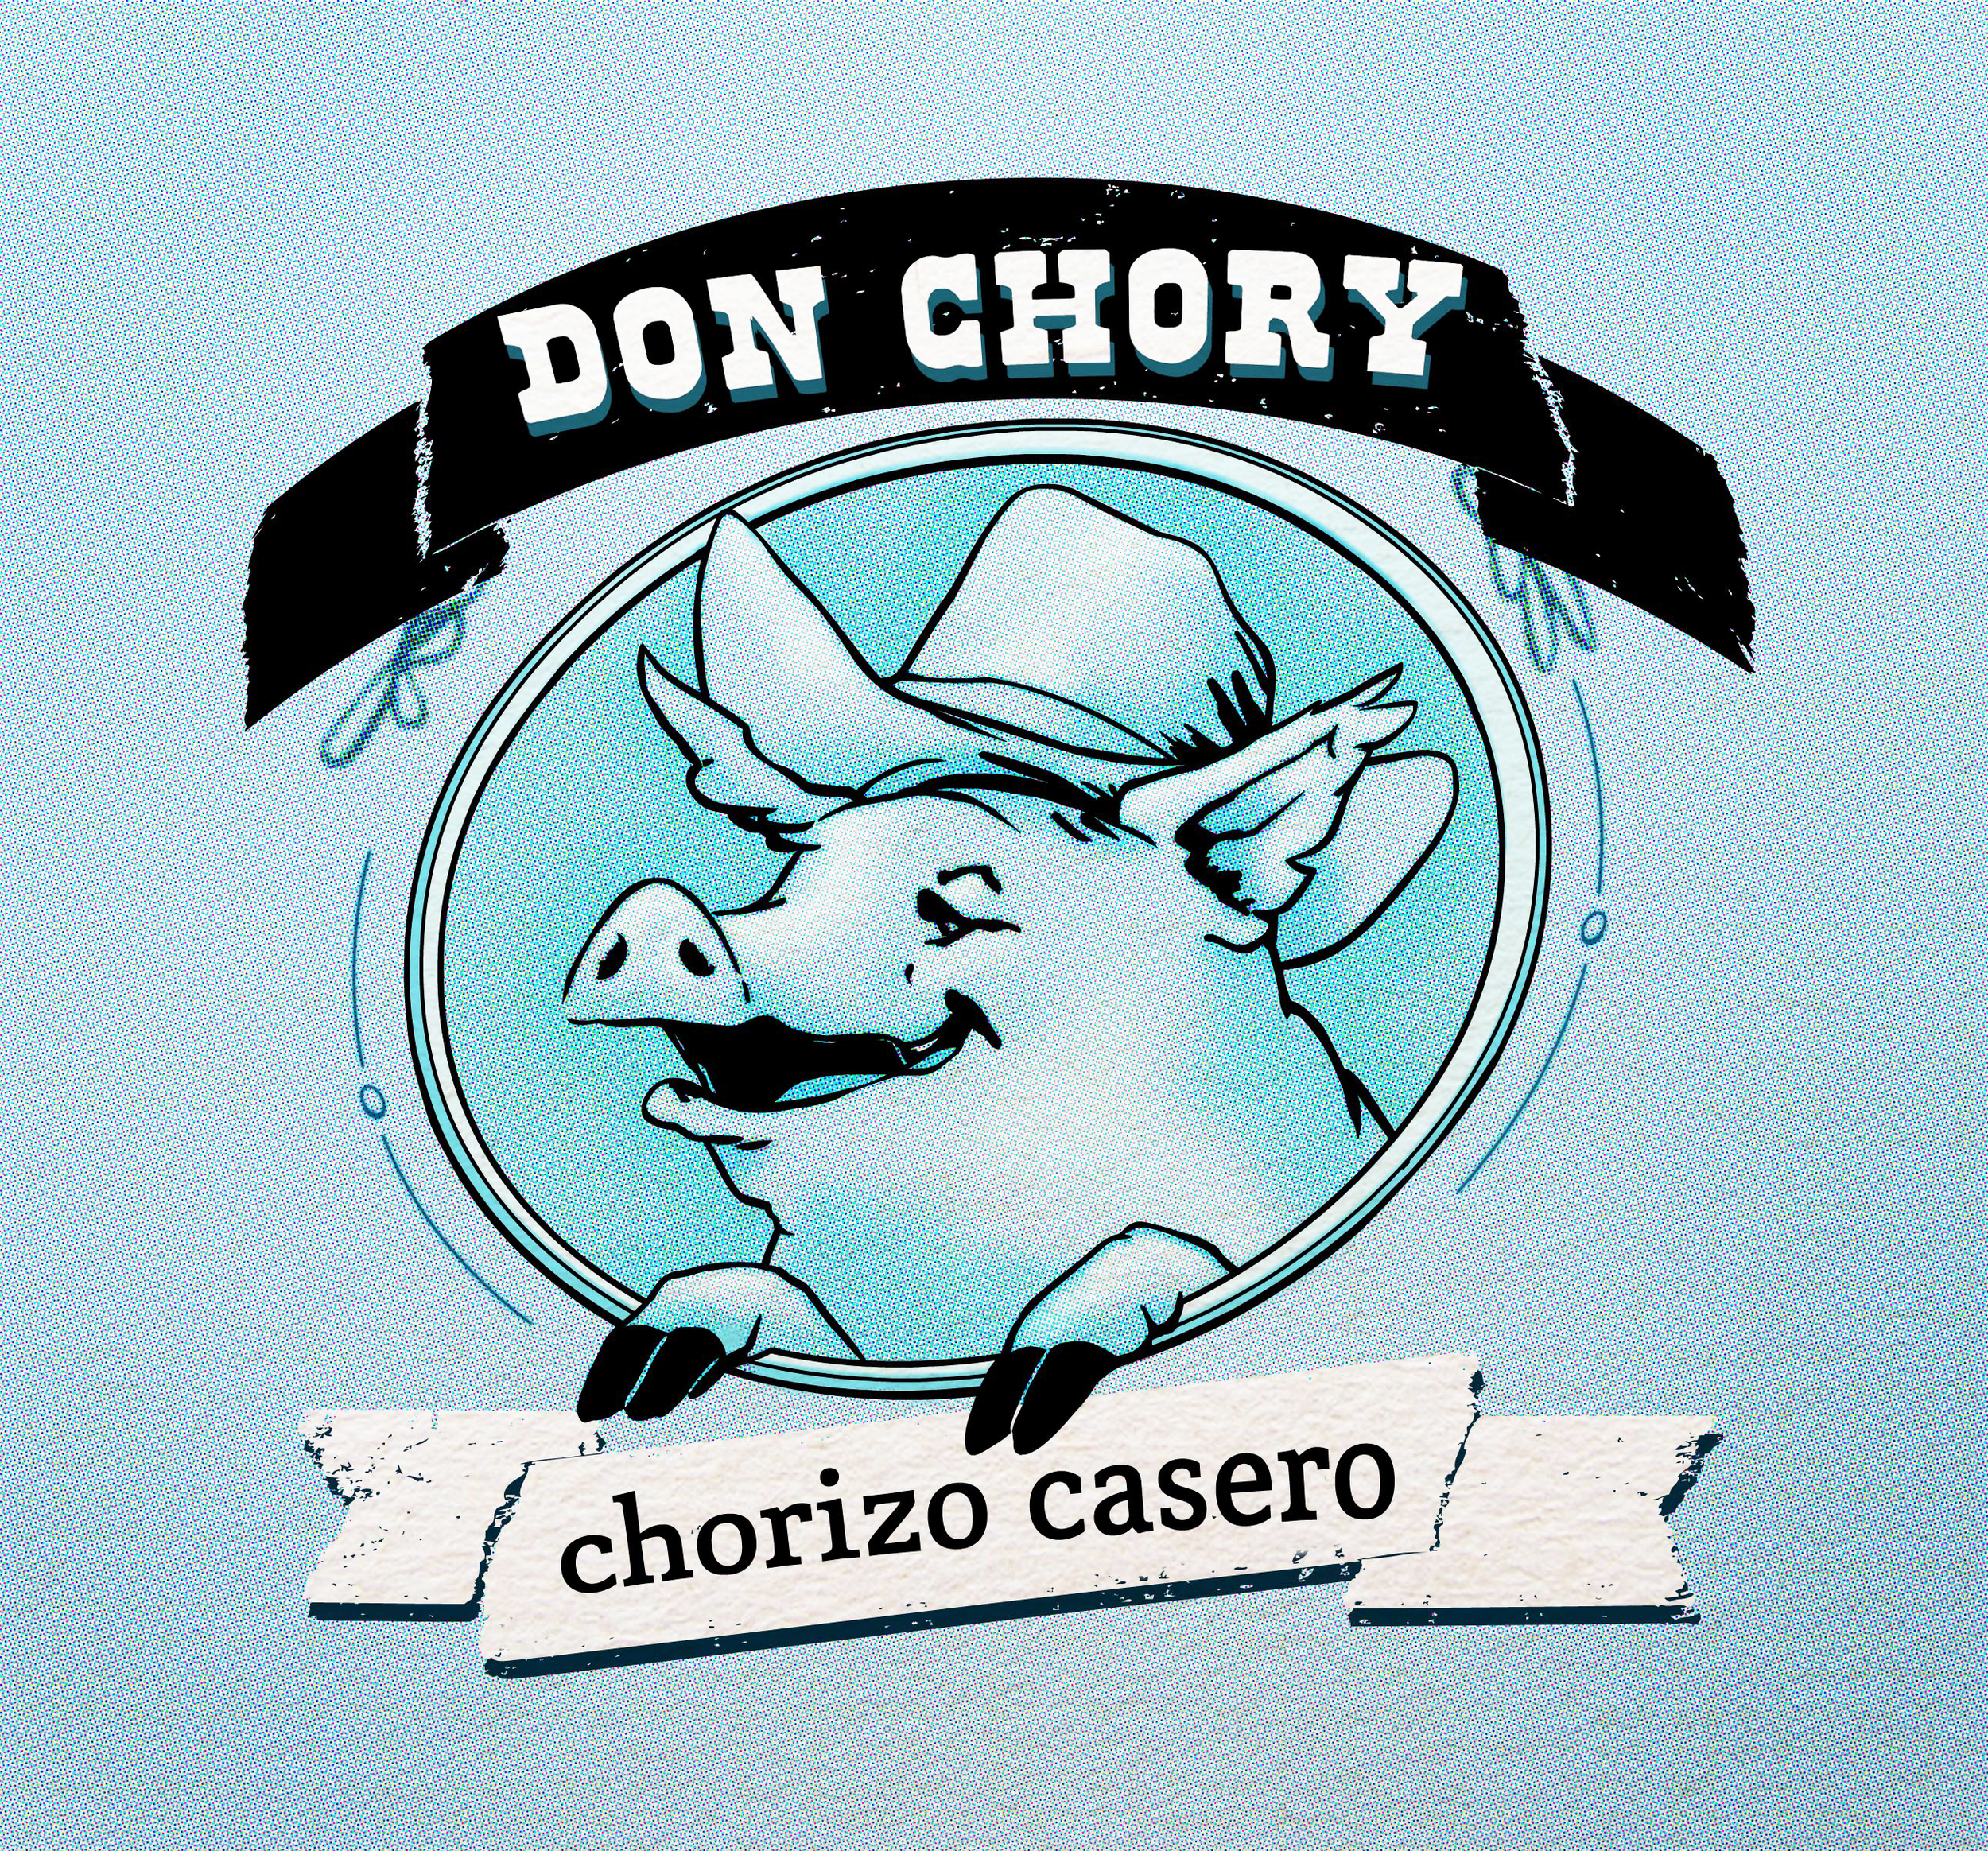 don_chory___chorizo_branding_concept_by_recedebo-d64mo2t.png